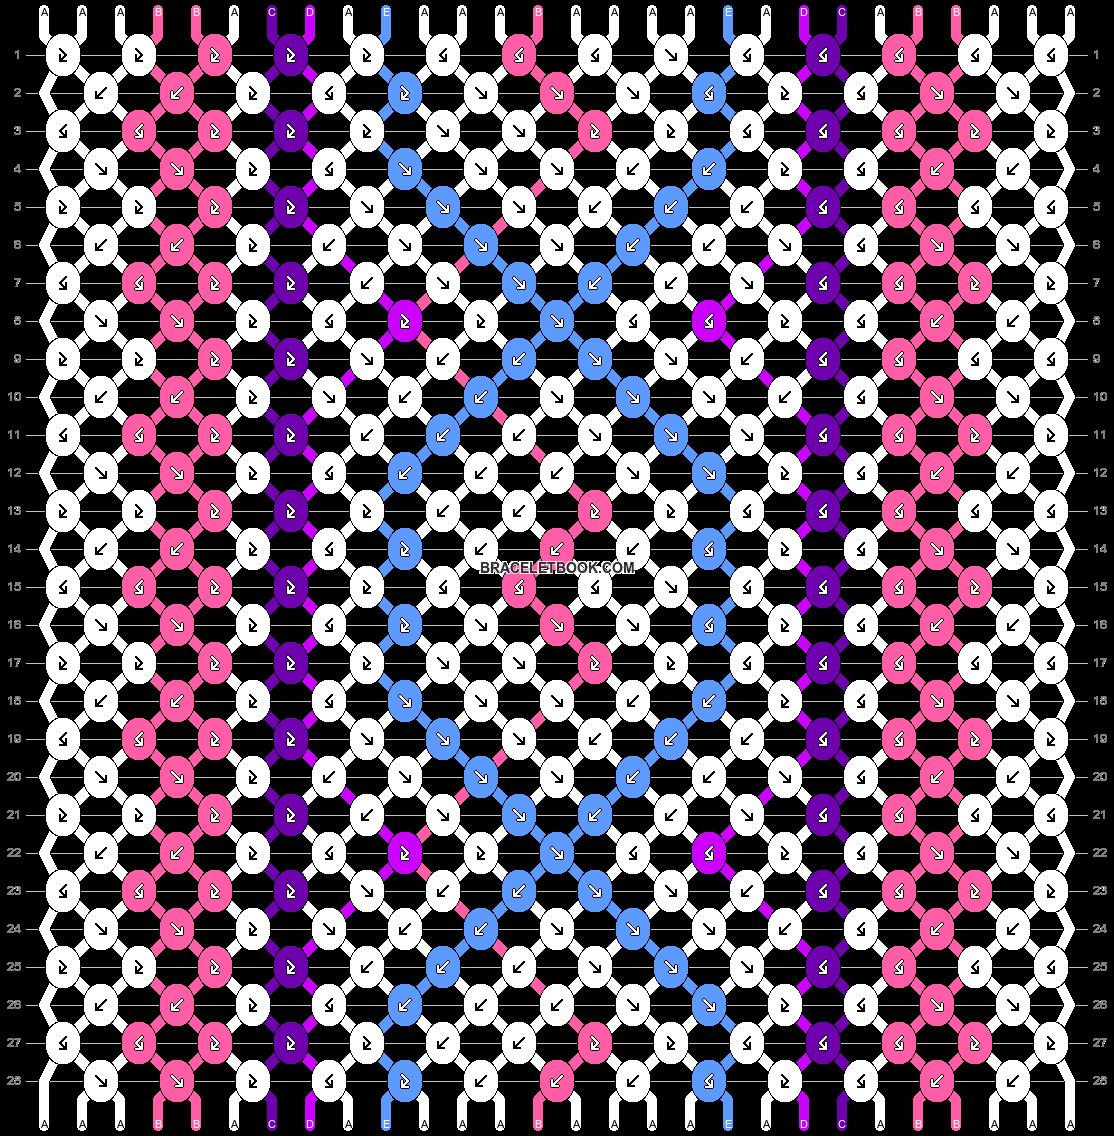 Normal Pattern #22498 added by CWillard